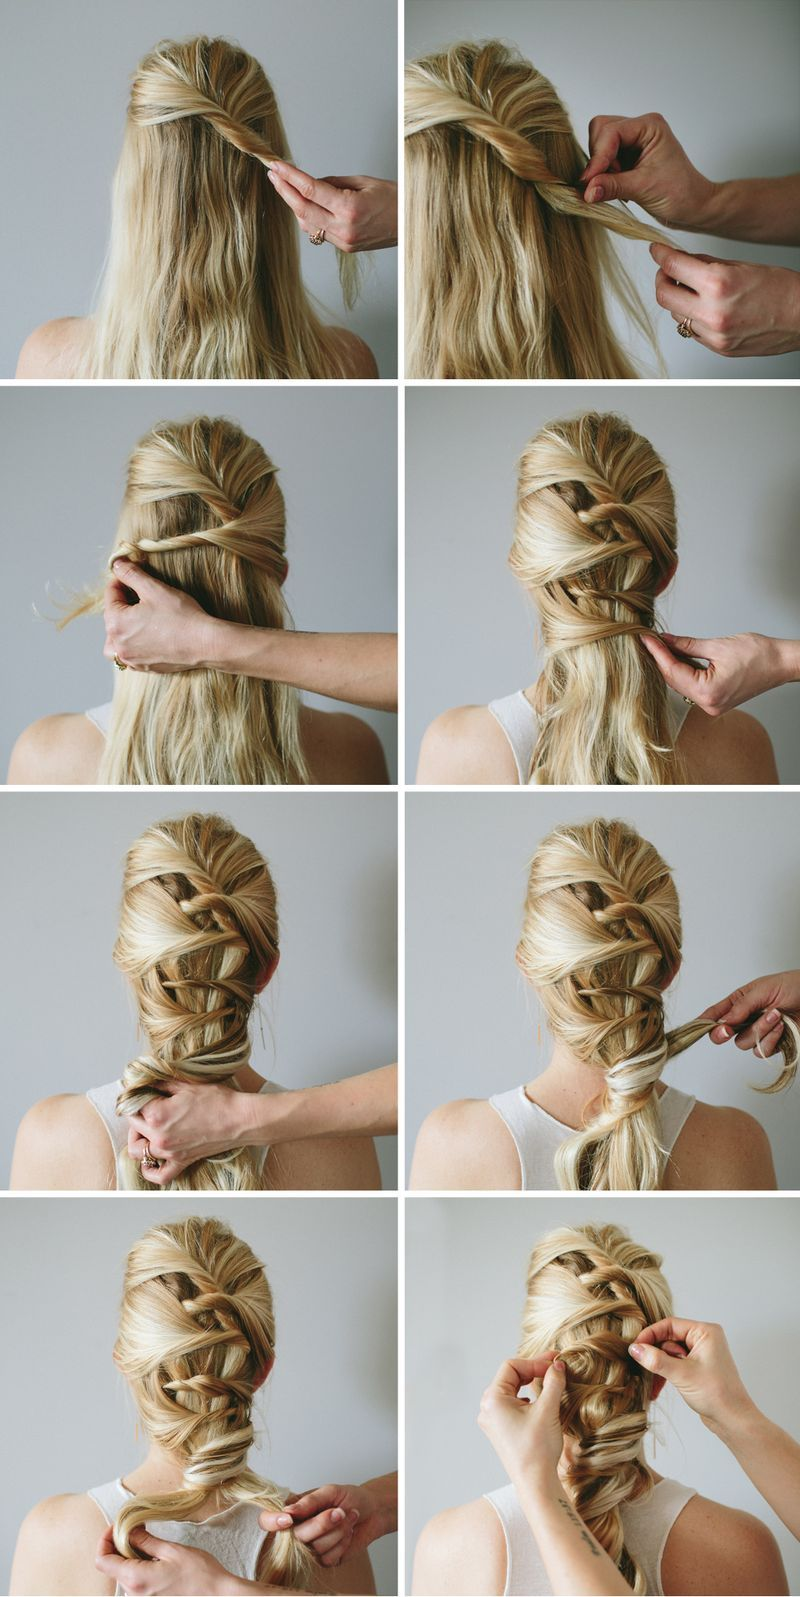 Easy Hairstyles For Short Hair To Do At Home Beauteous Romantic Twist Braid Hair Tutorial  Blonde Hair Colors  Hair